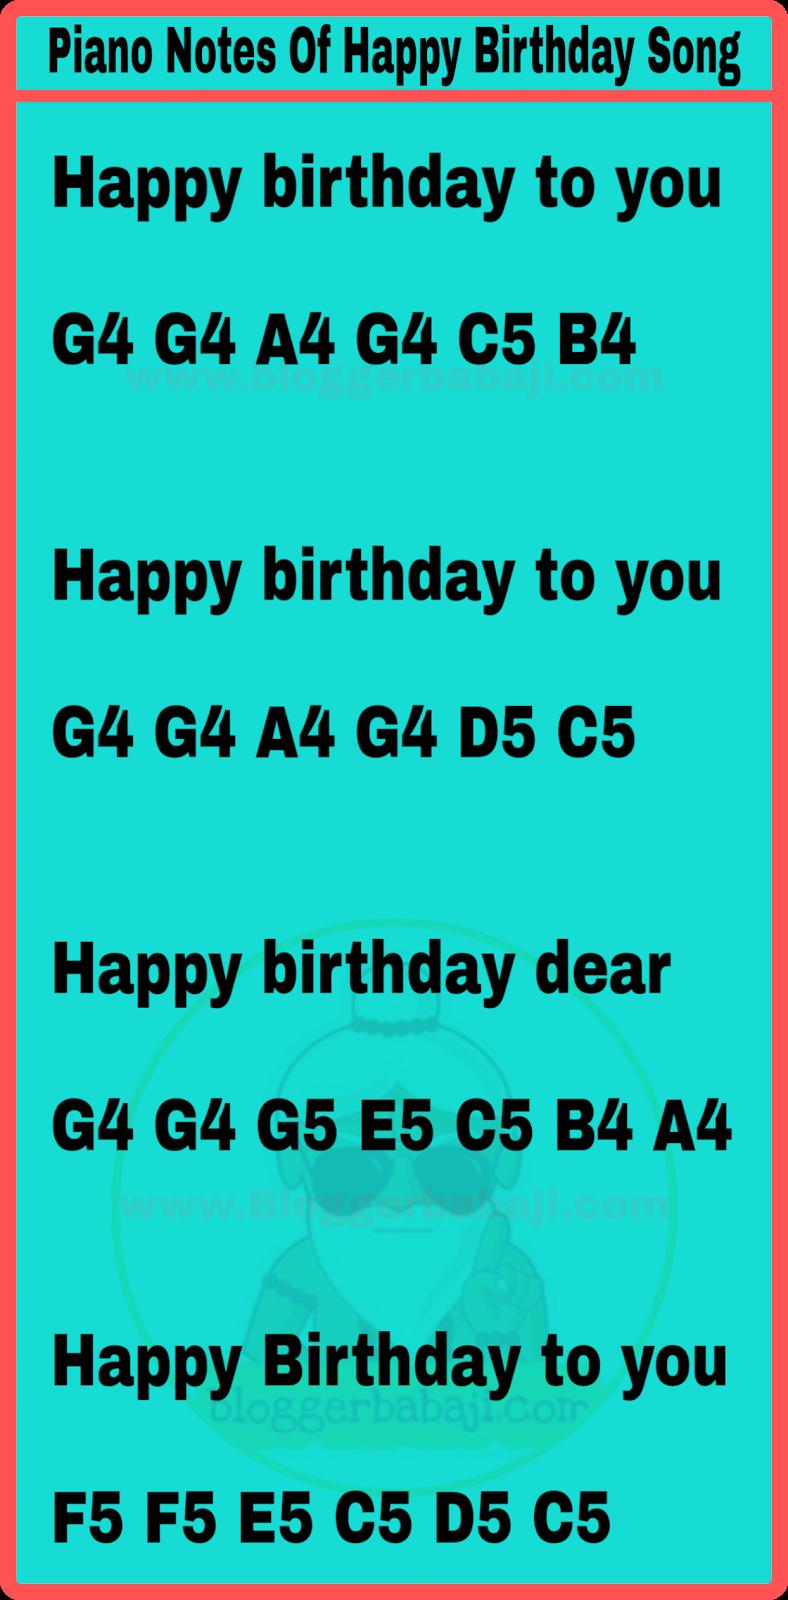 Piano Notes Of Happy Birthday Song